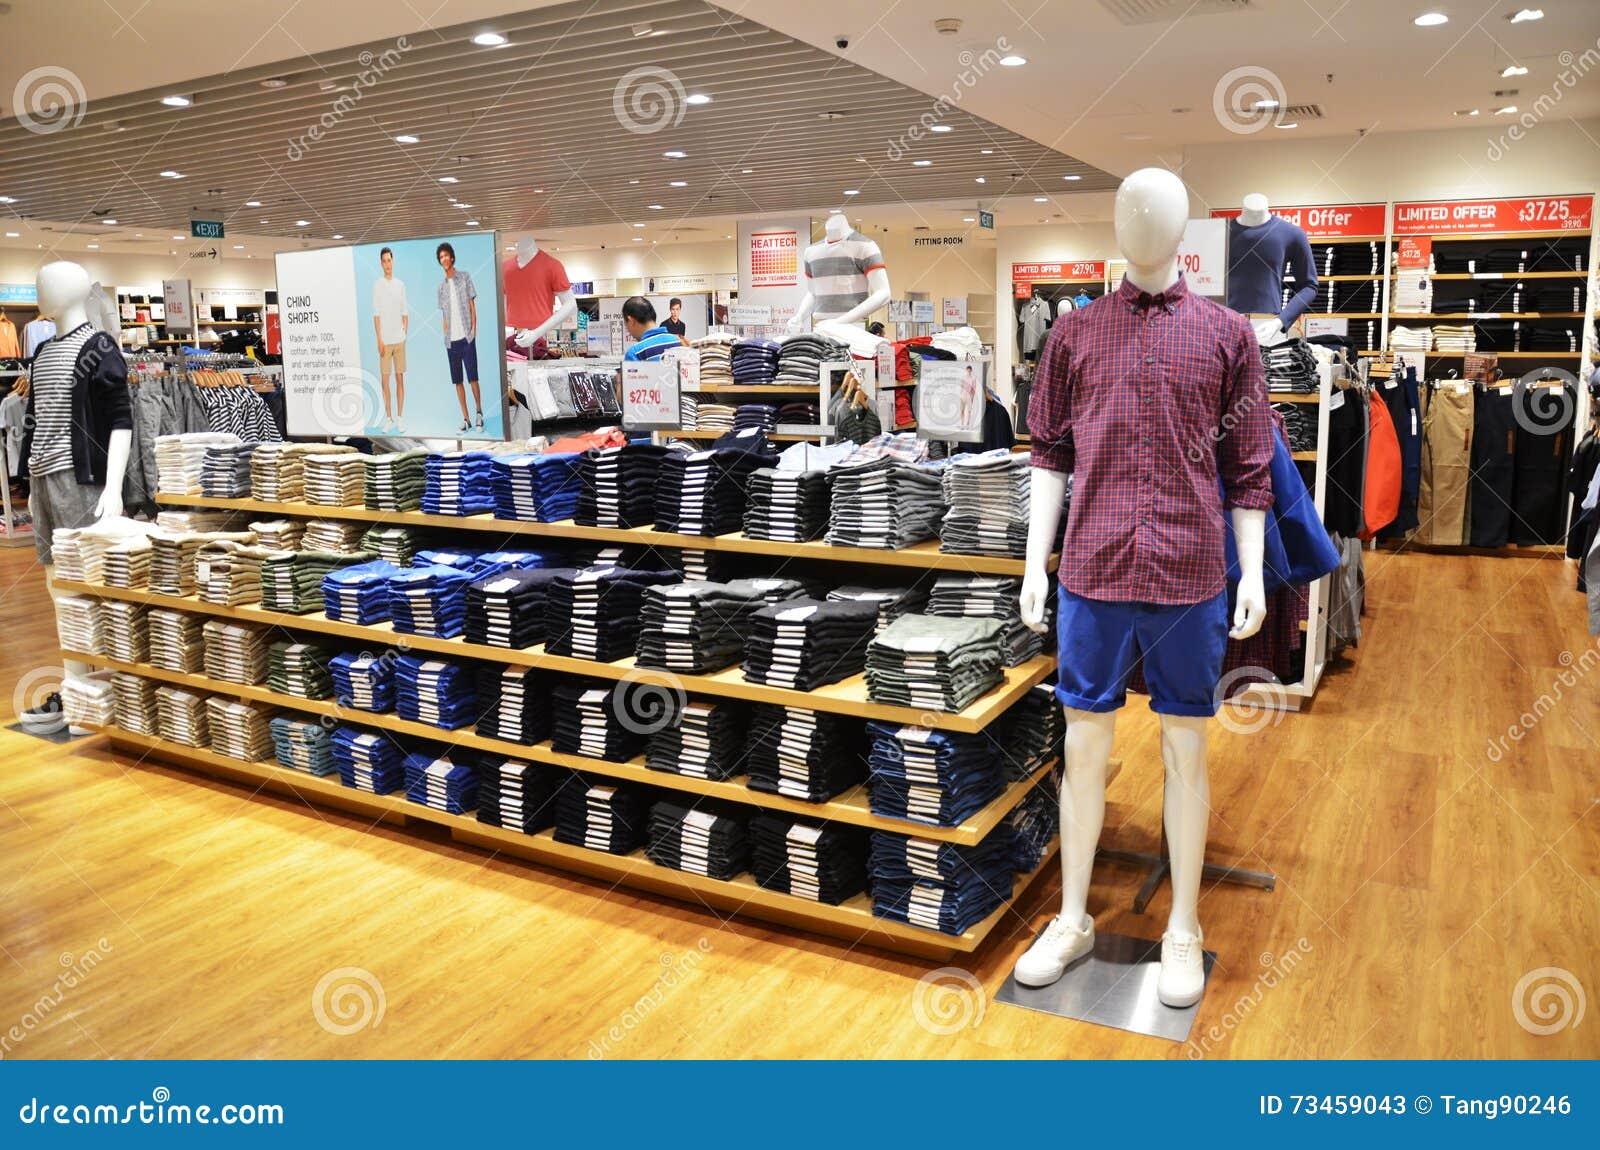 Uniqlo Store In Changi Airport, Singapore Editorial Photo - Image ...